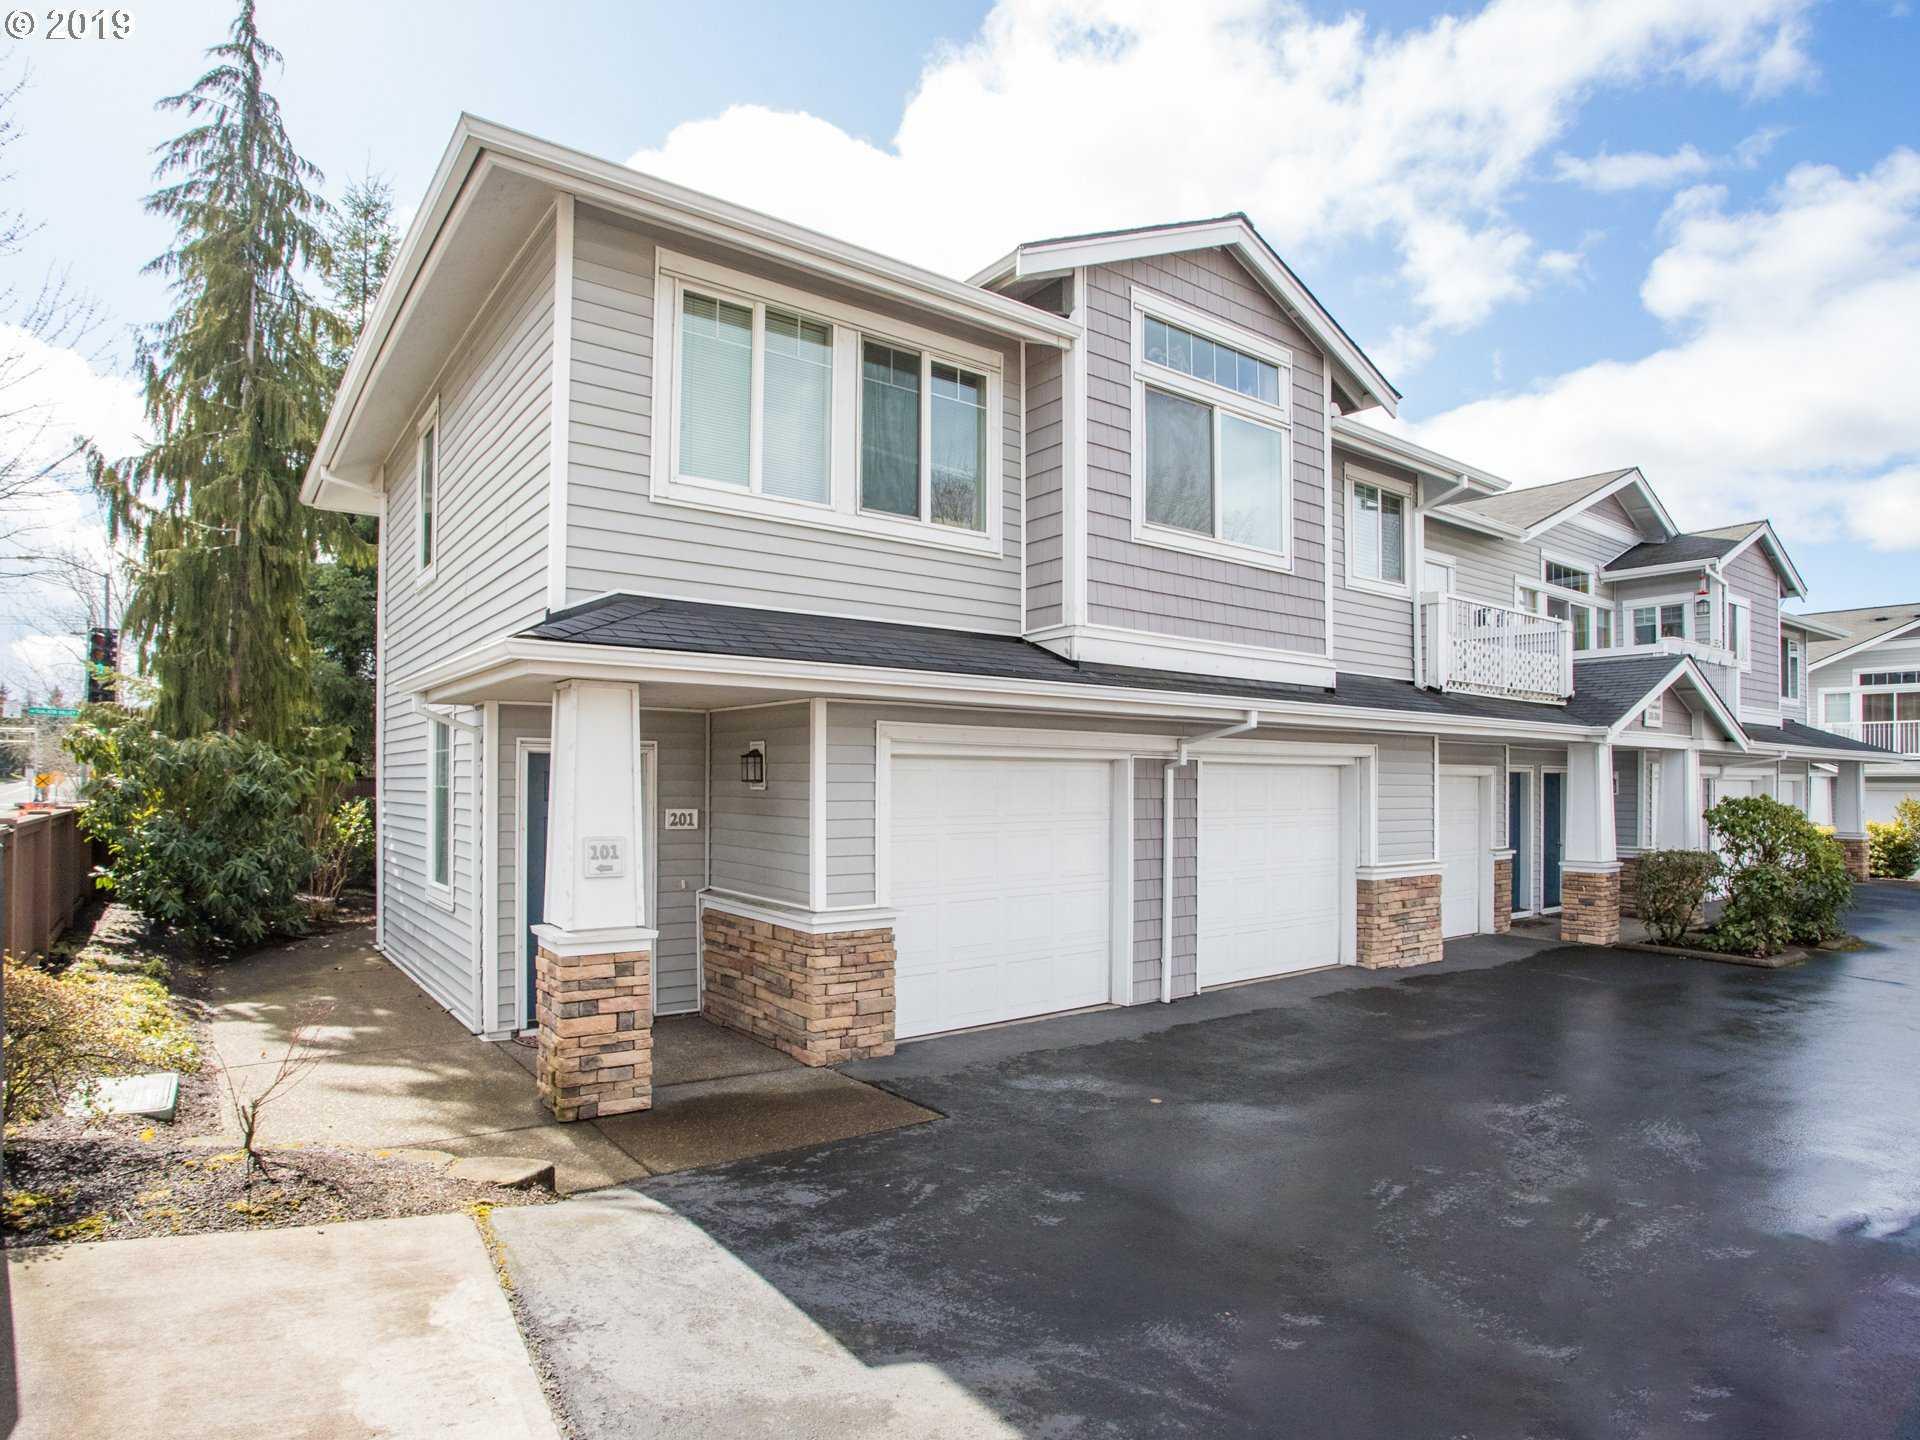 $239,900 - 2Br/2Ba -  for Sale in Beaverton